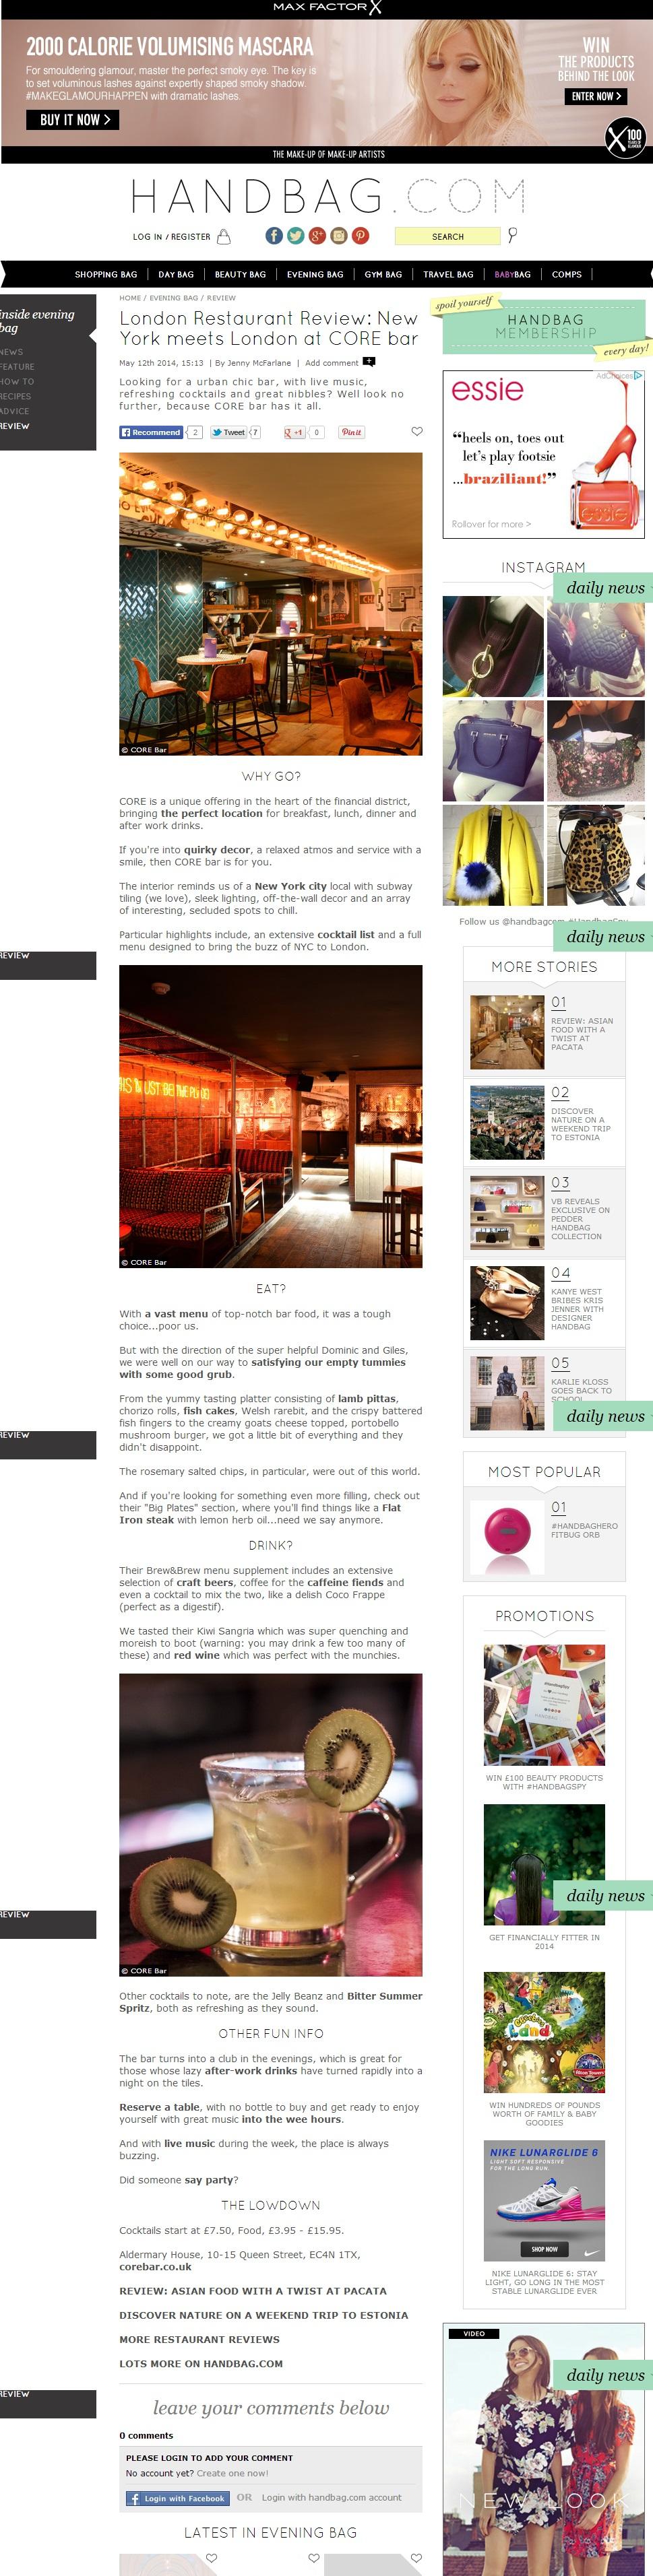 screencapture-www-handbag-com-evening-bag-review-a570431-london-restaurant-review-new-york-meets-london-at-core-bar-html